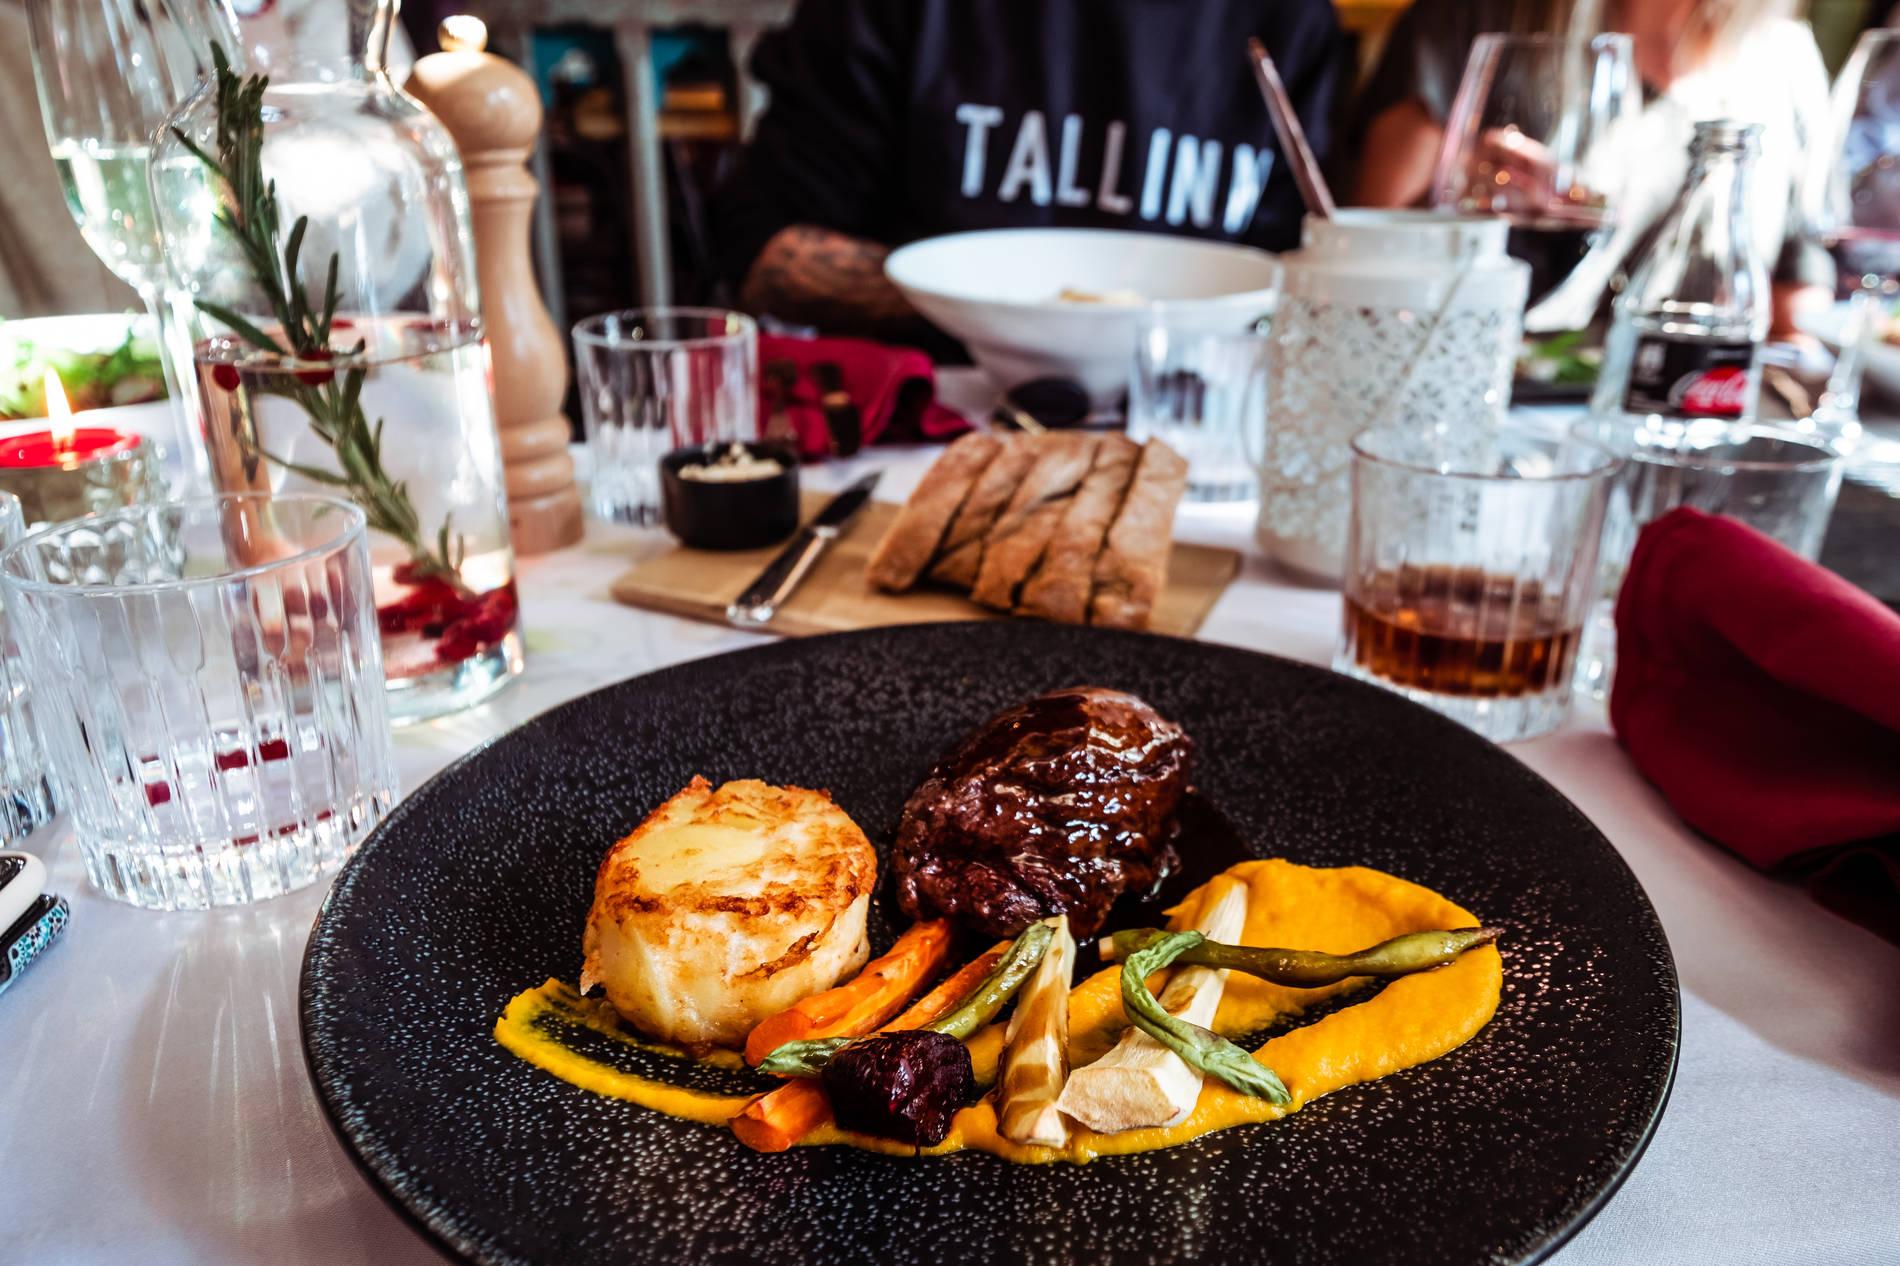 Restaurant in Tallinn